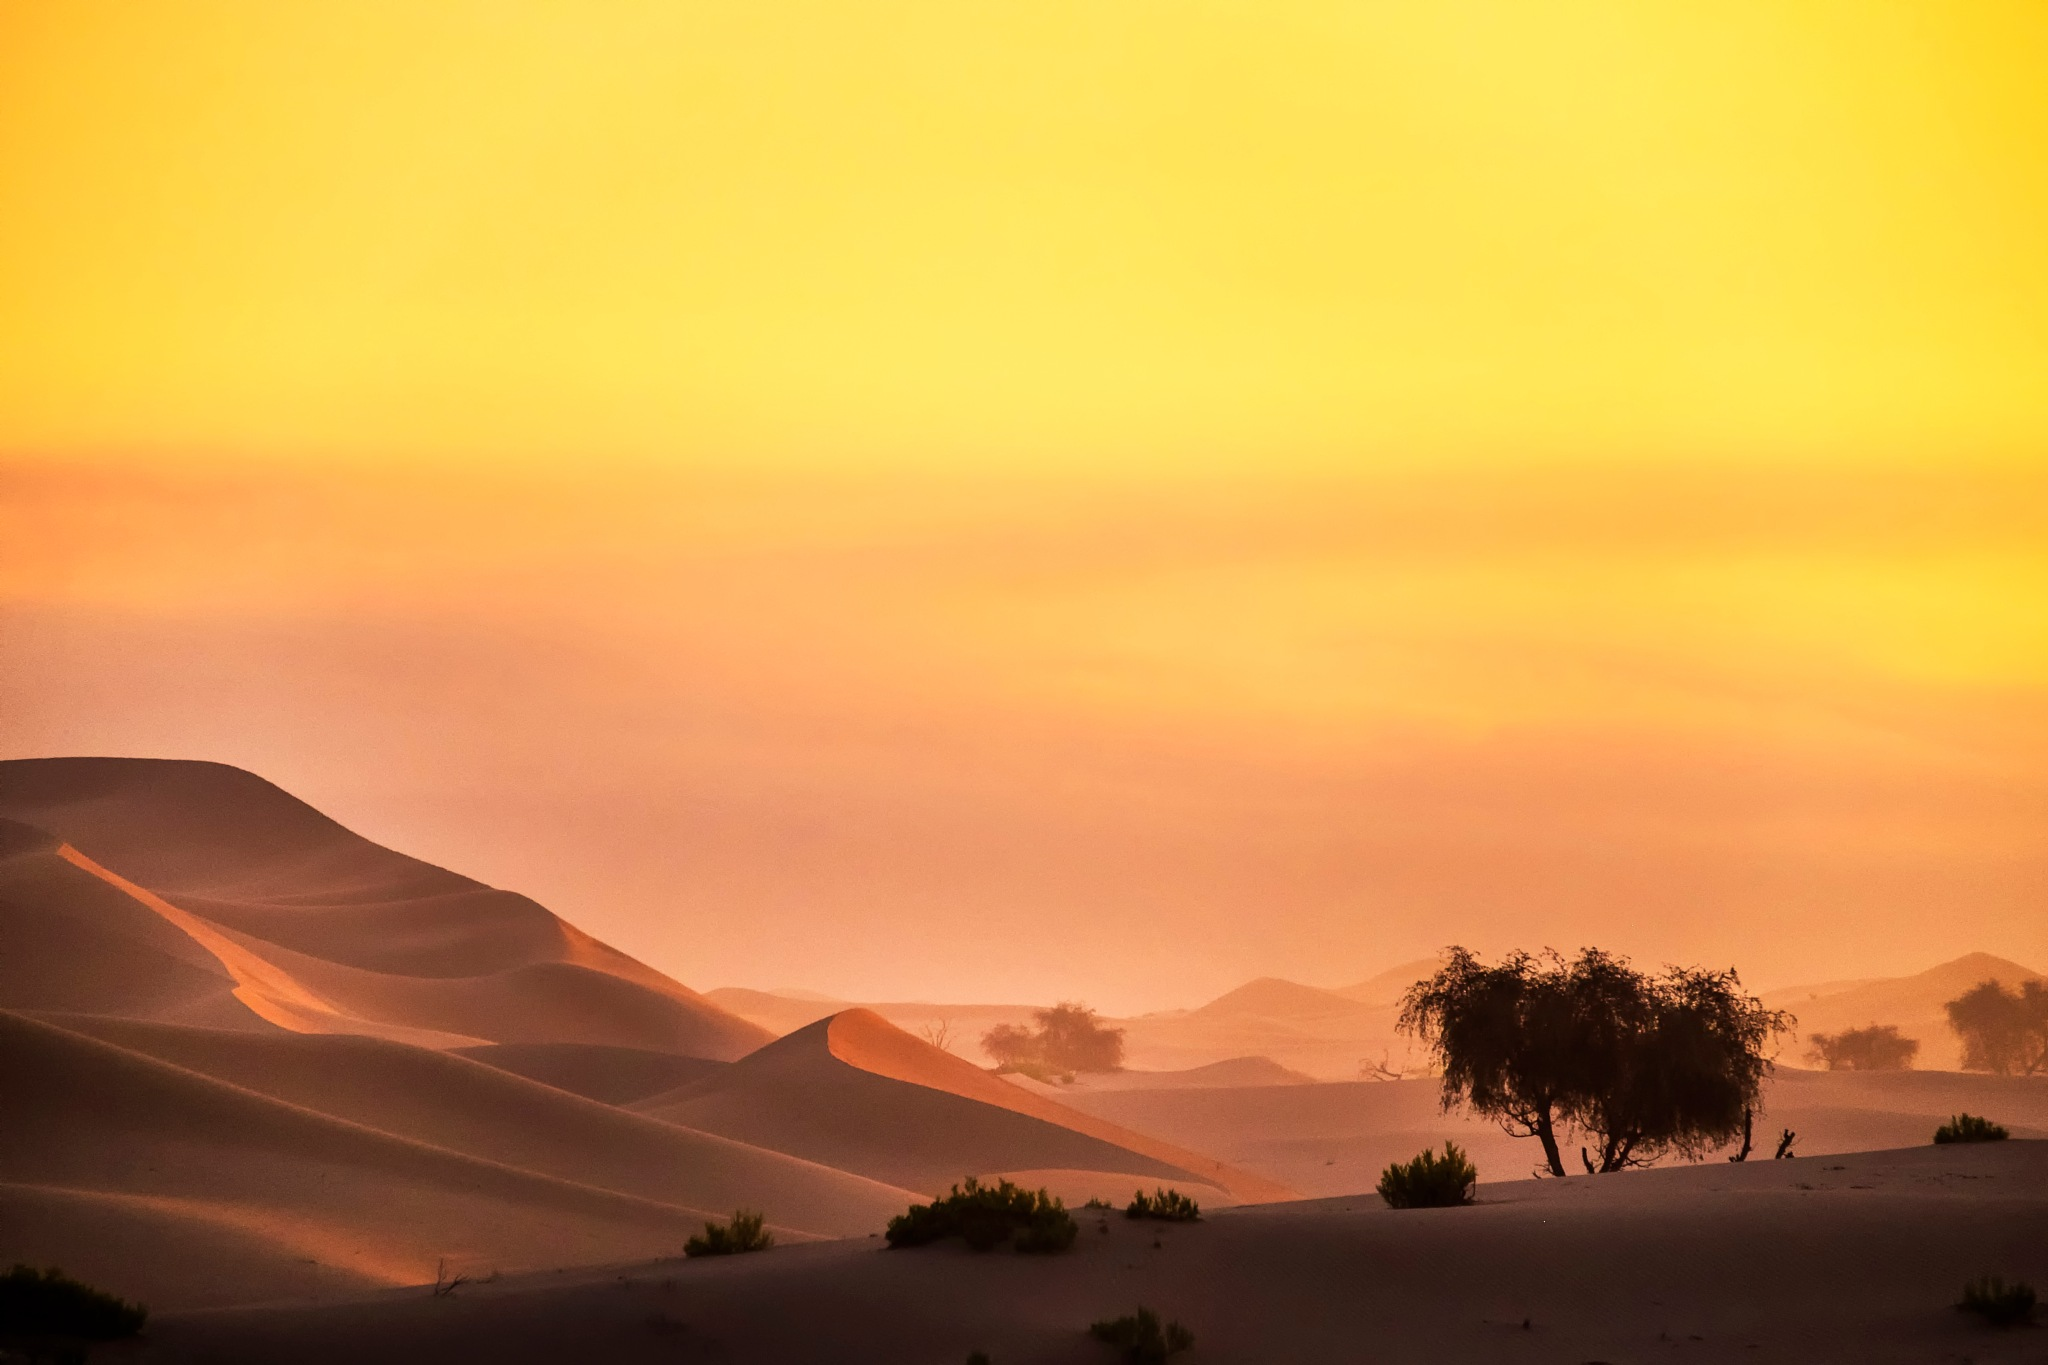 Before Sunrise by Flerida Pajate